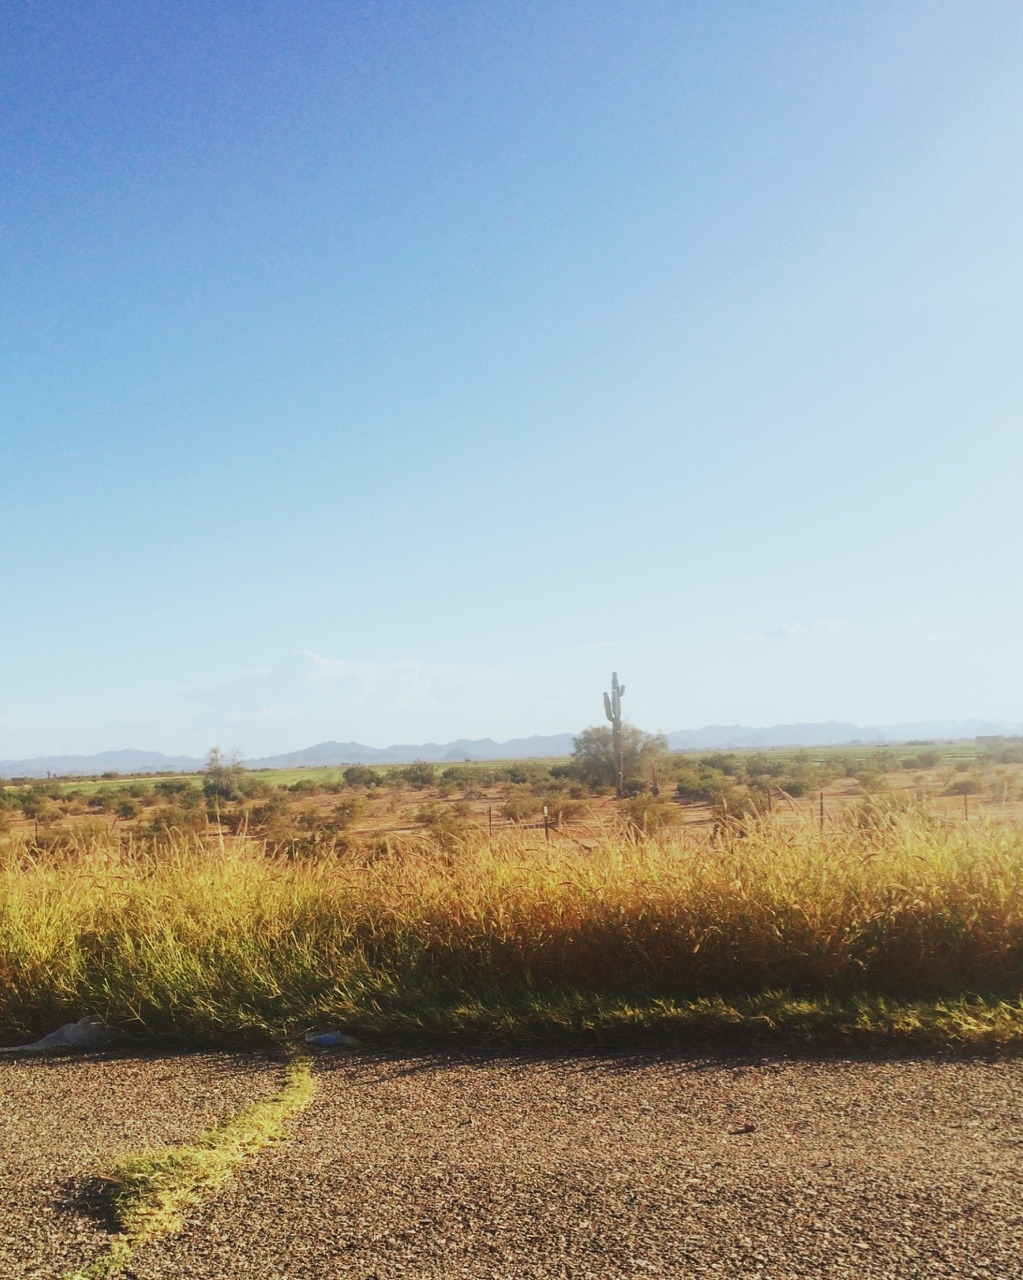 Arizona. Traffic. Road side.